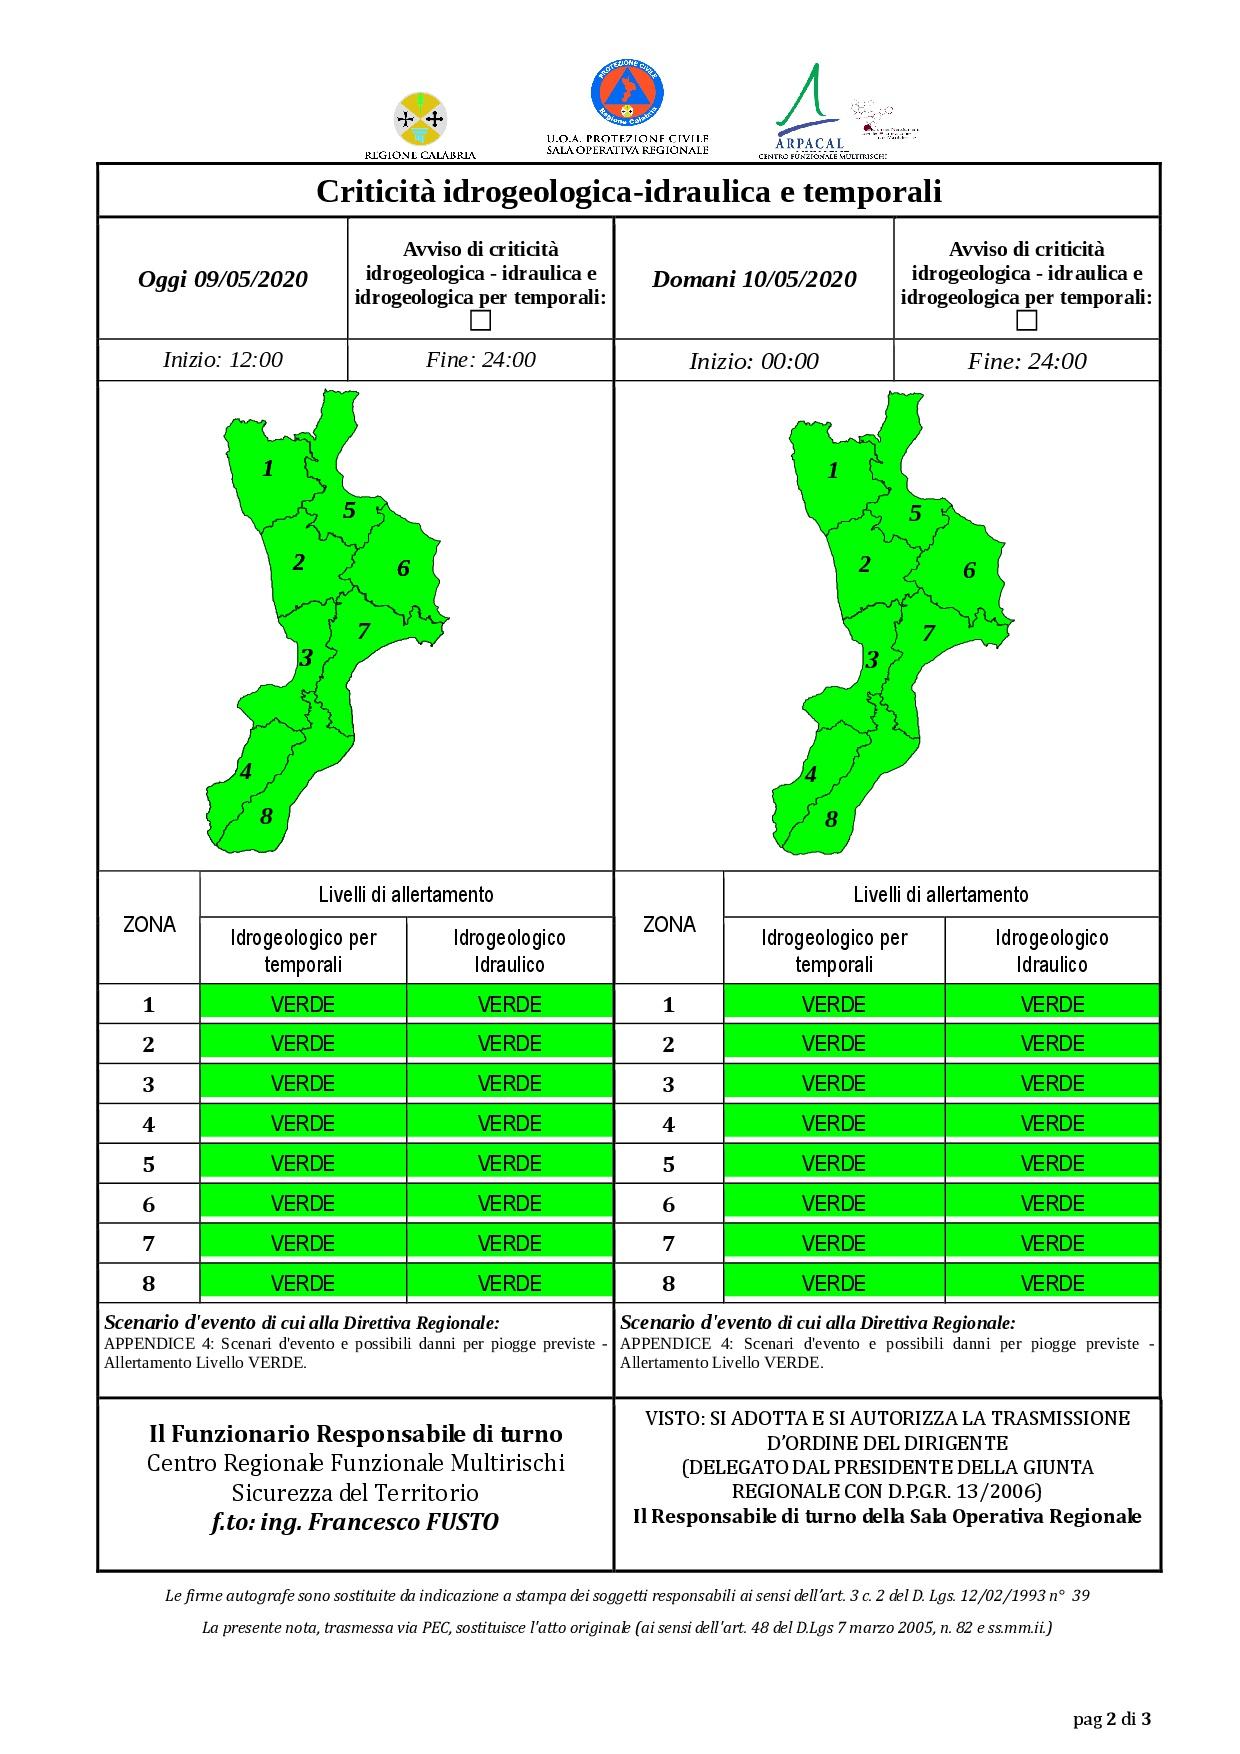 Criticità idrogeologica-idraulica e temporali in Calabria 09-05-2020